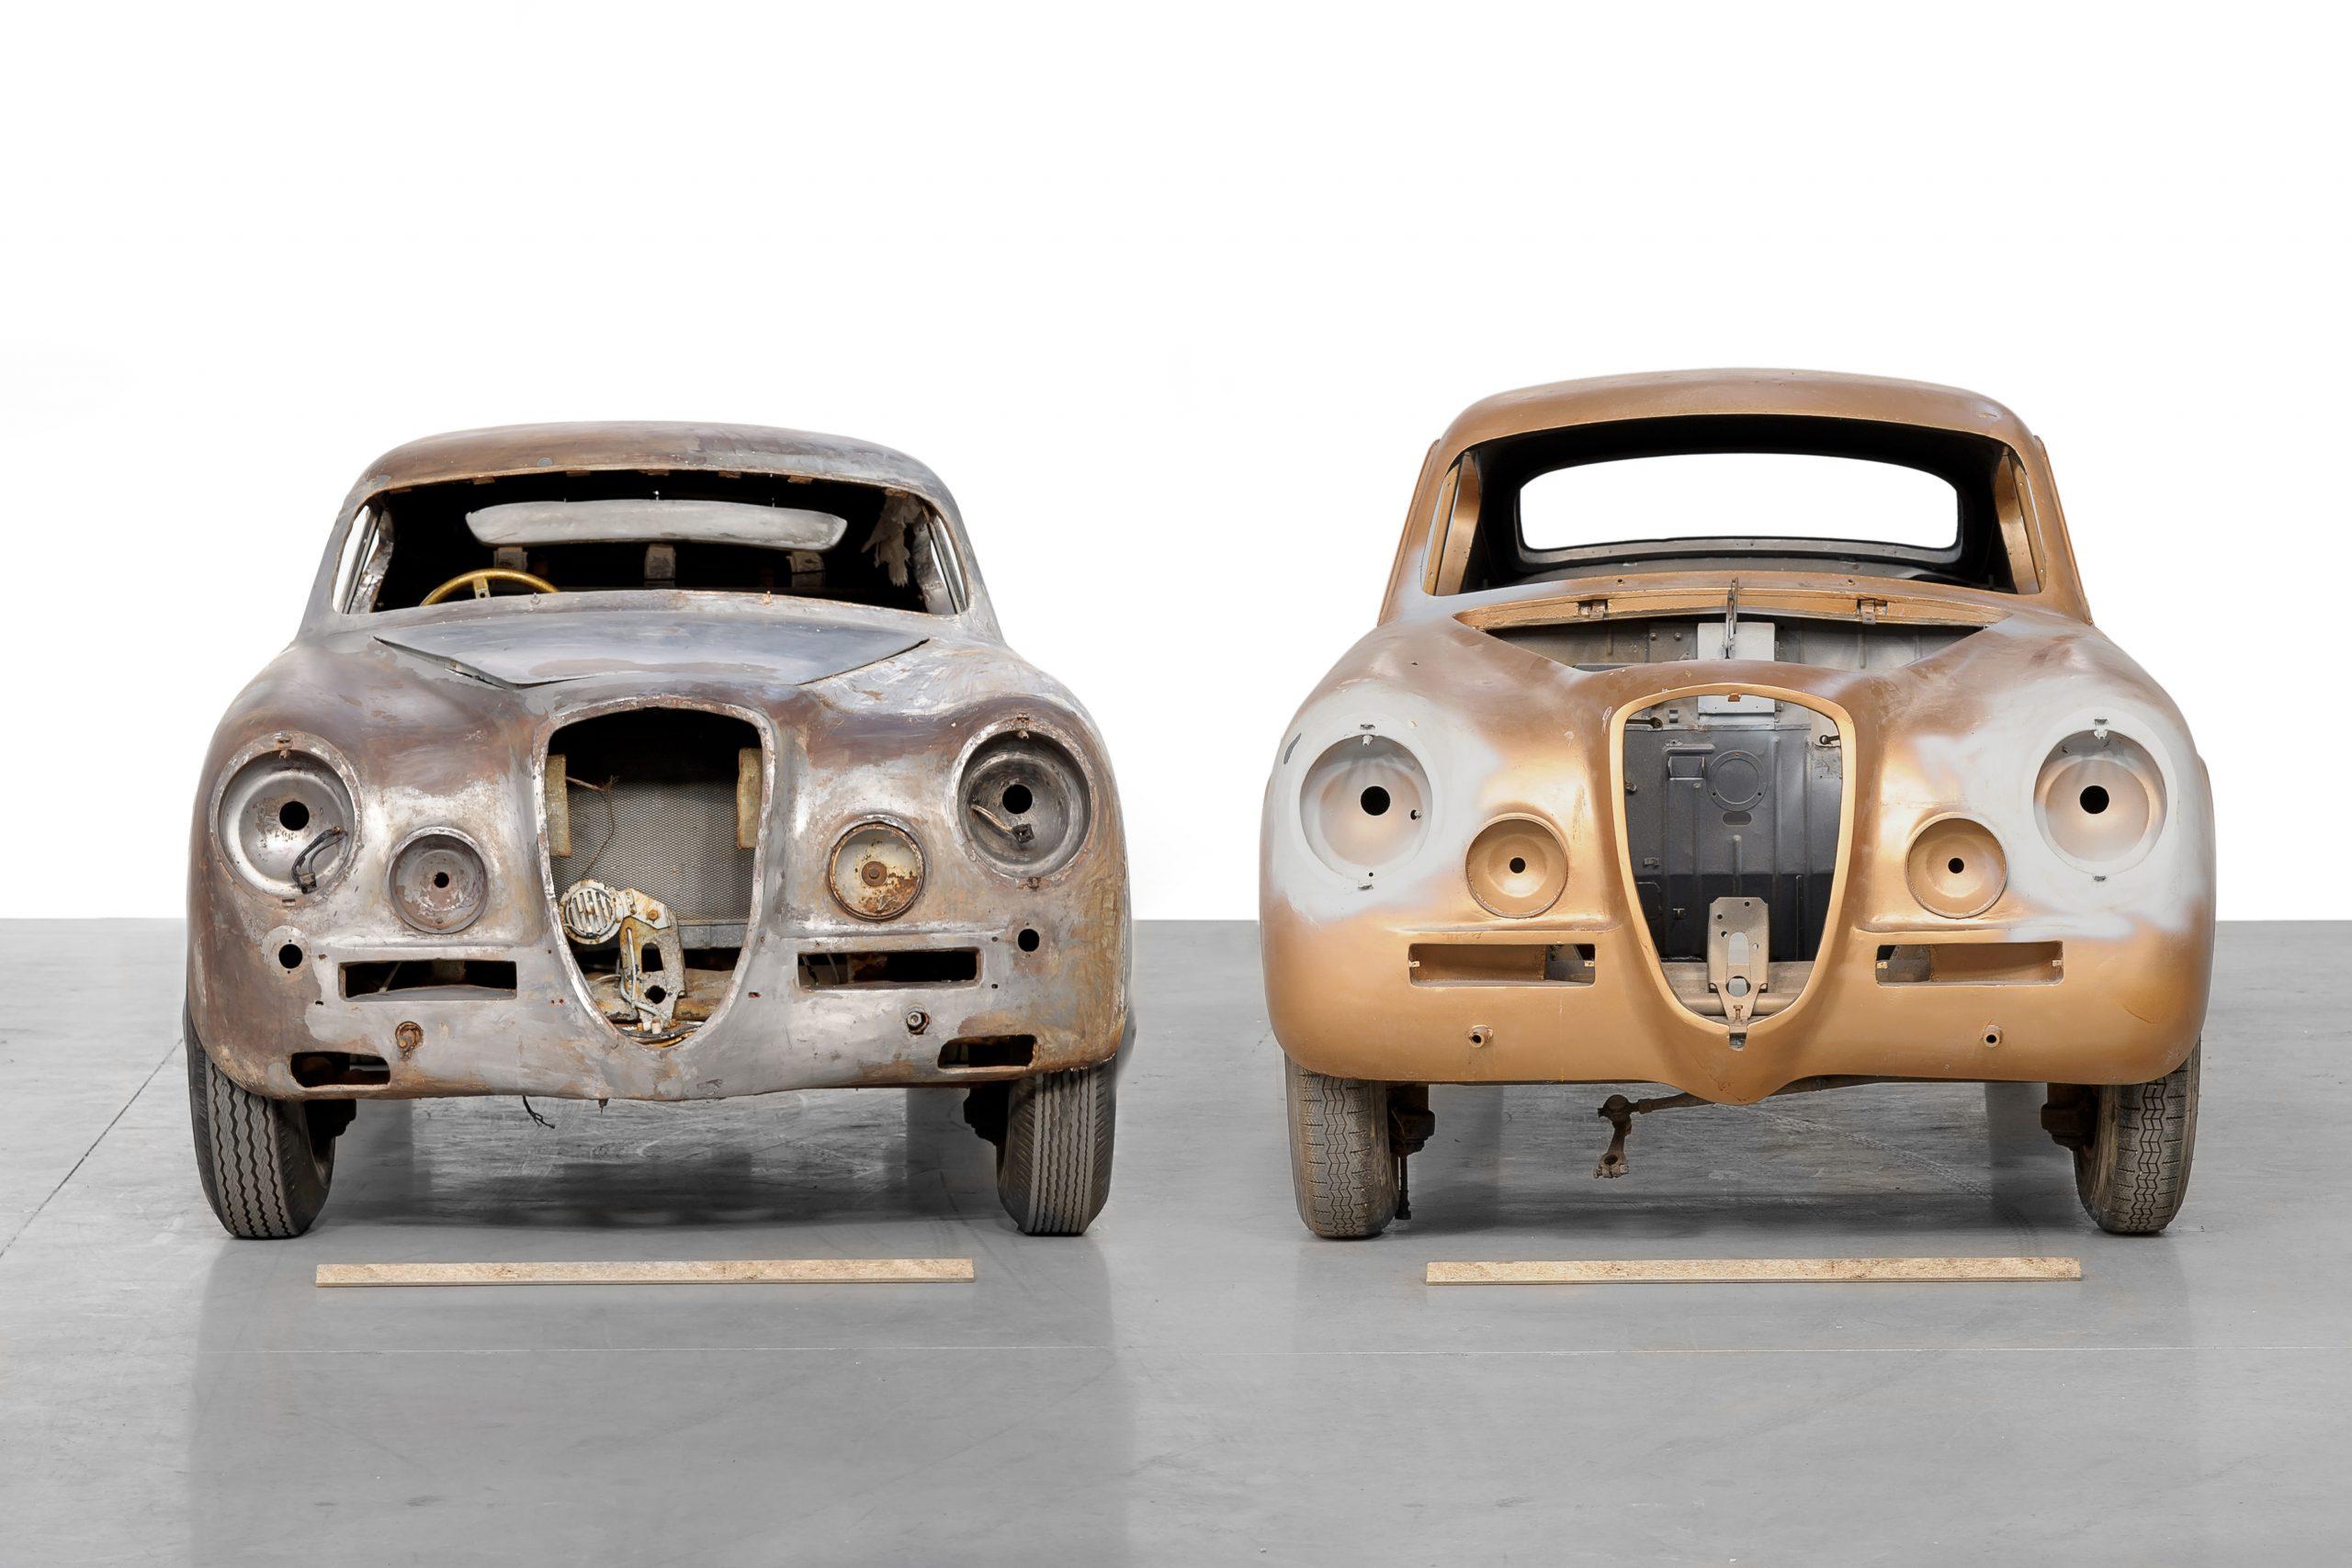 1951 Lancia Aurelia Bracco restoration